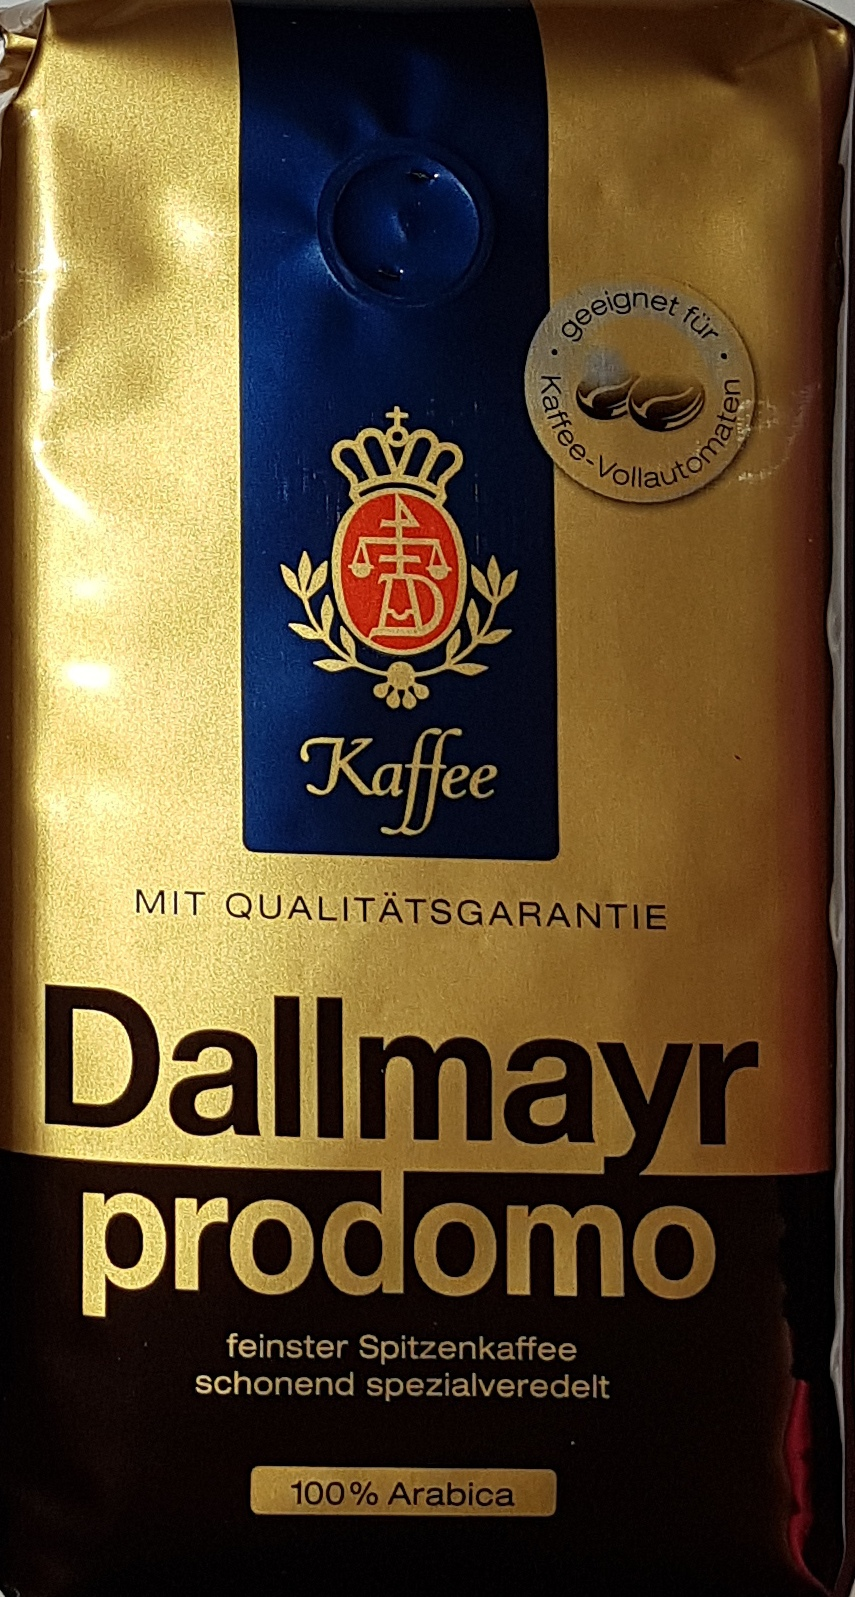 dallmayr prodomo kaffee 500g gemahlen bohnen filterkaffee kaffeemaschine automat ebay. Black Bedroom Furniture Sets. Home Design Ideas